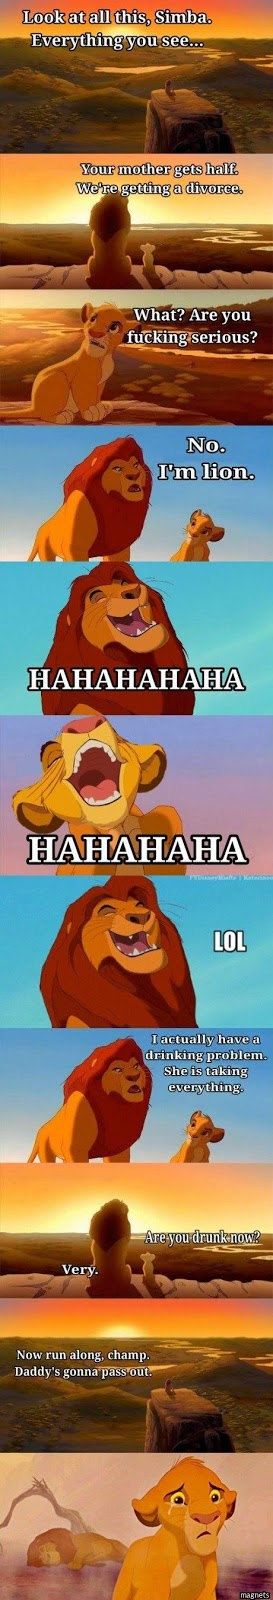 Mufasa tells Simba he's a drunk